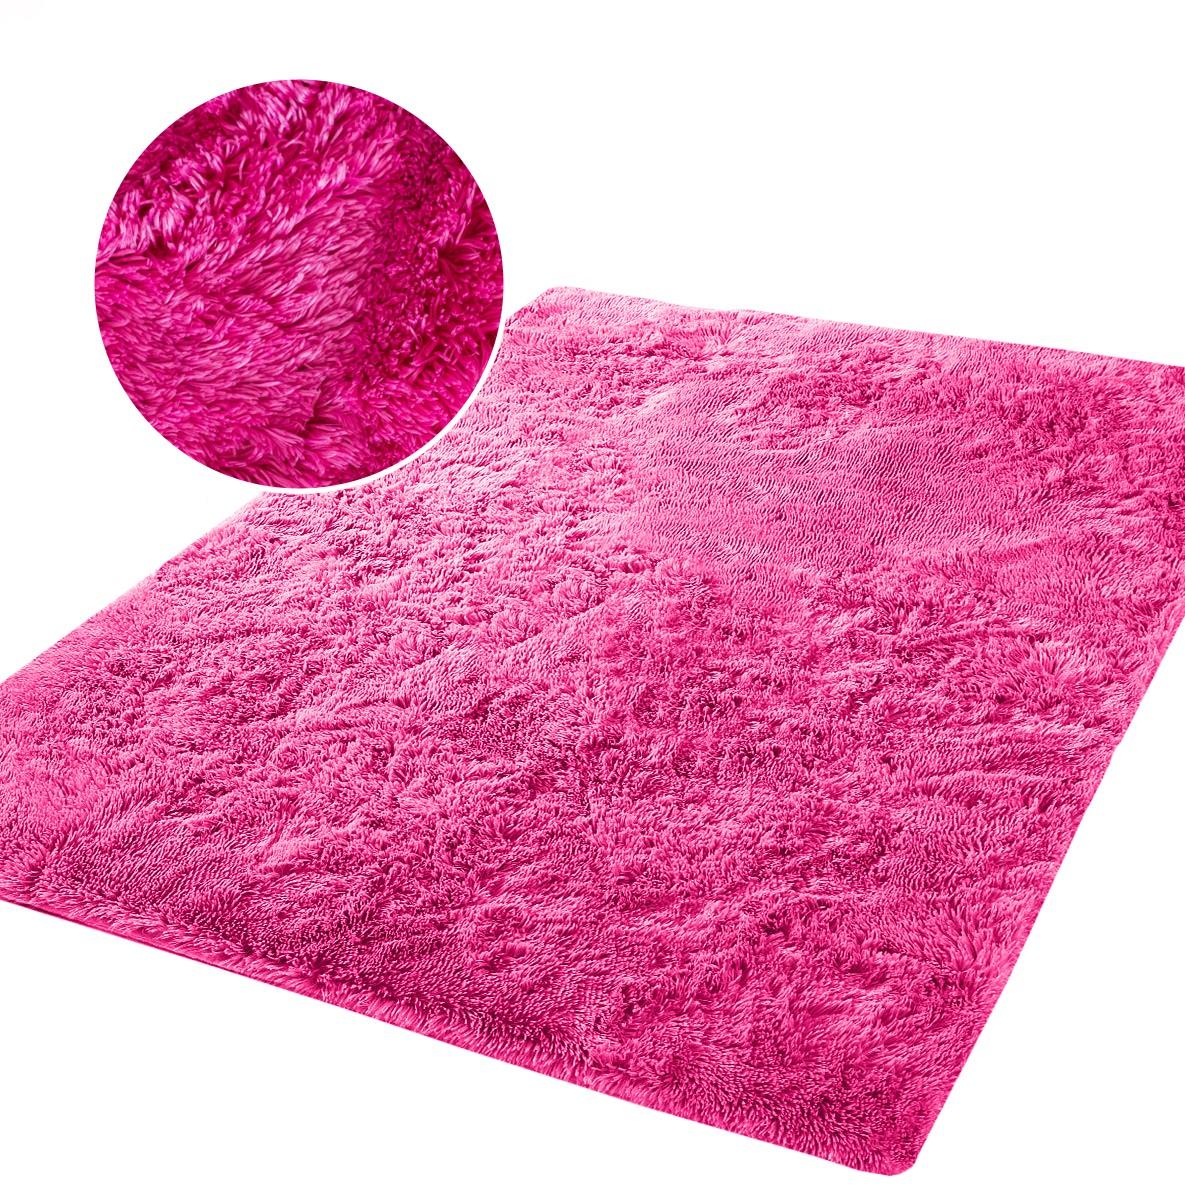 Měkký plyšový koberec chlupatý mikrovlákna 160x230  růžový neon